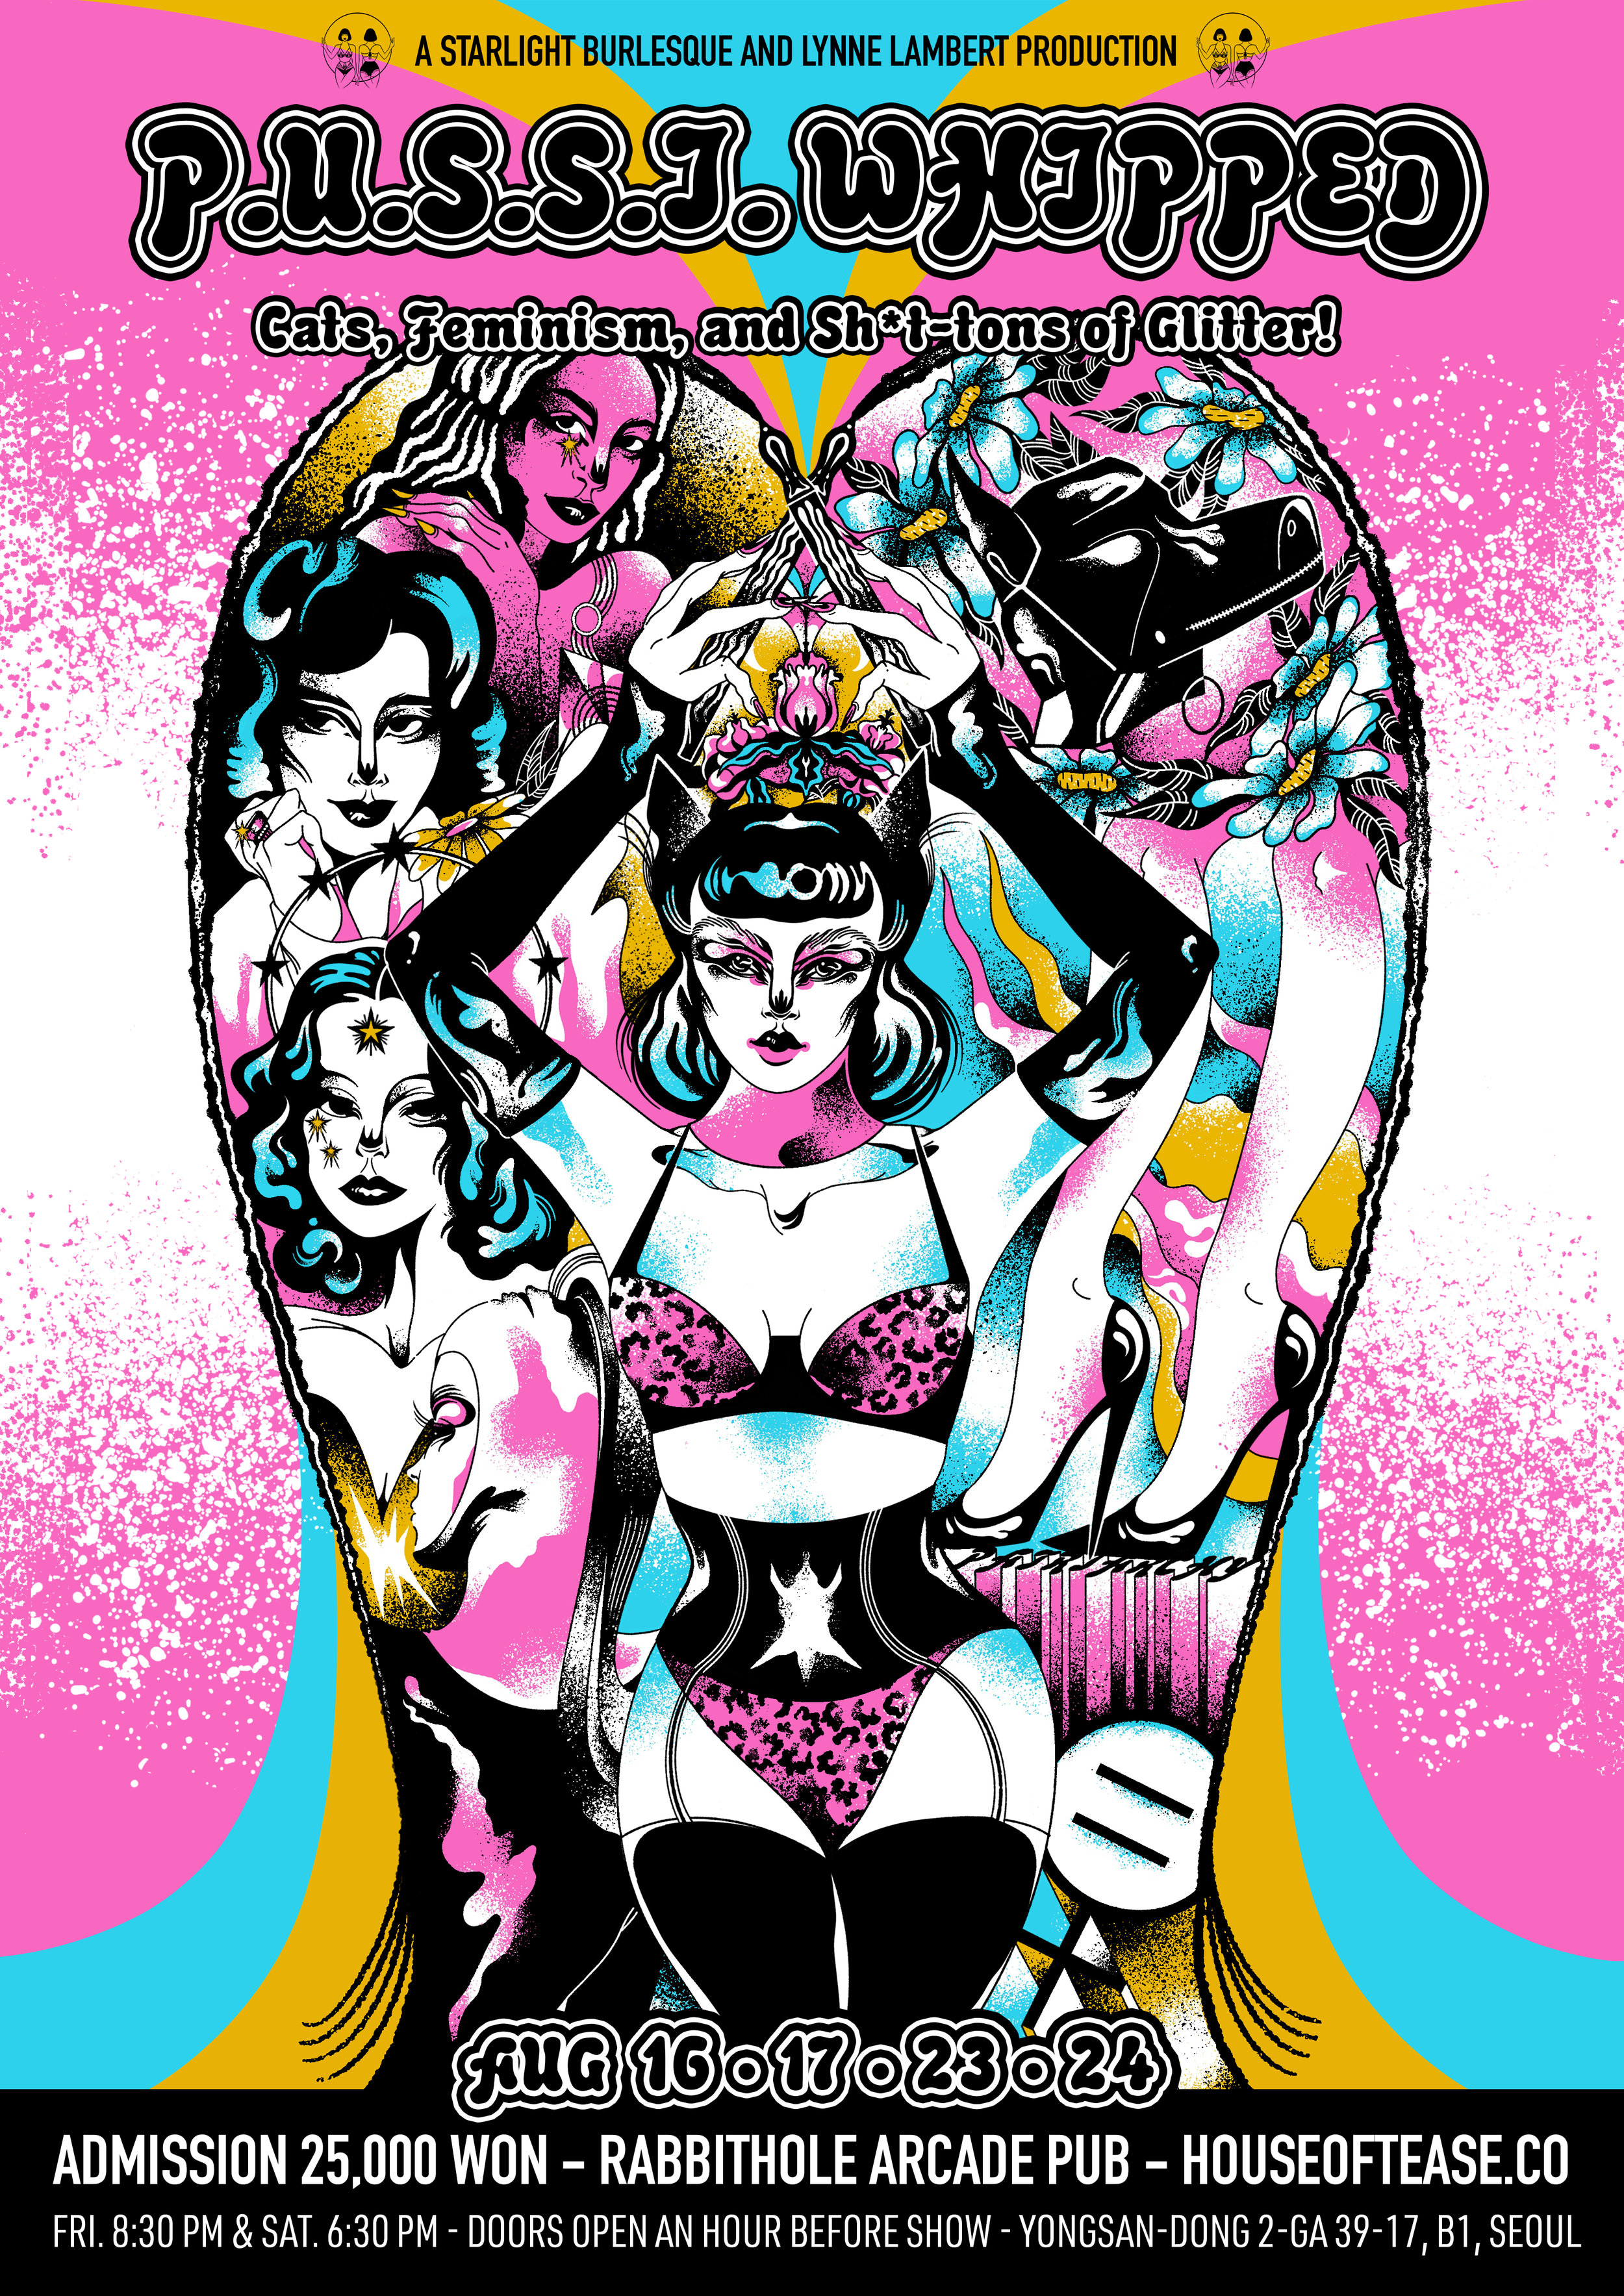 P.U.S.S.I Whipped - Cats, Feminism, & Sh*t-tons of Glitter!